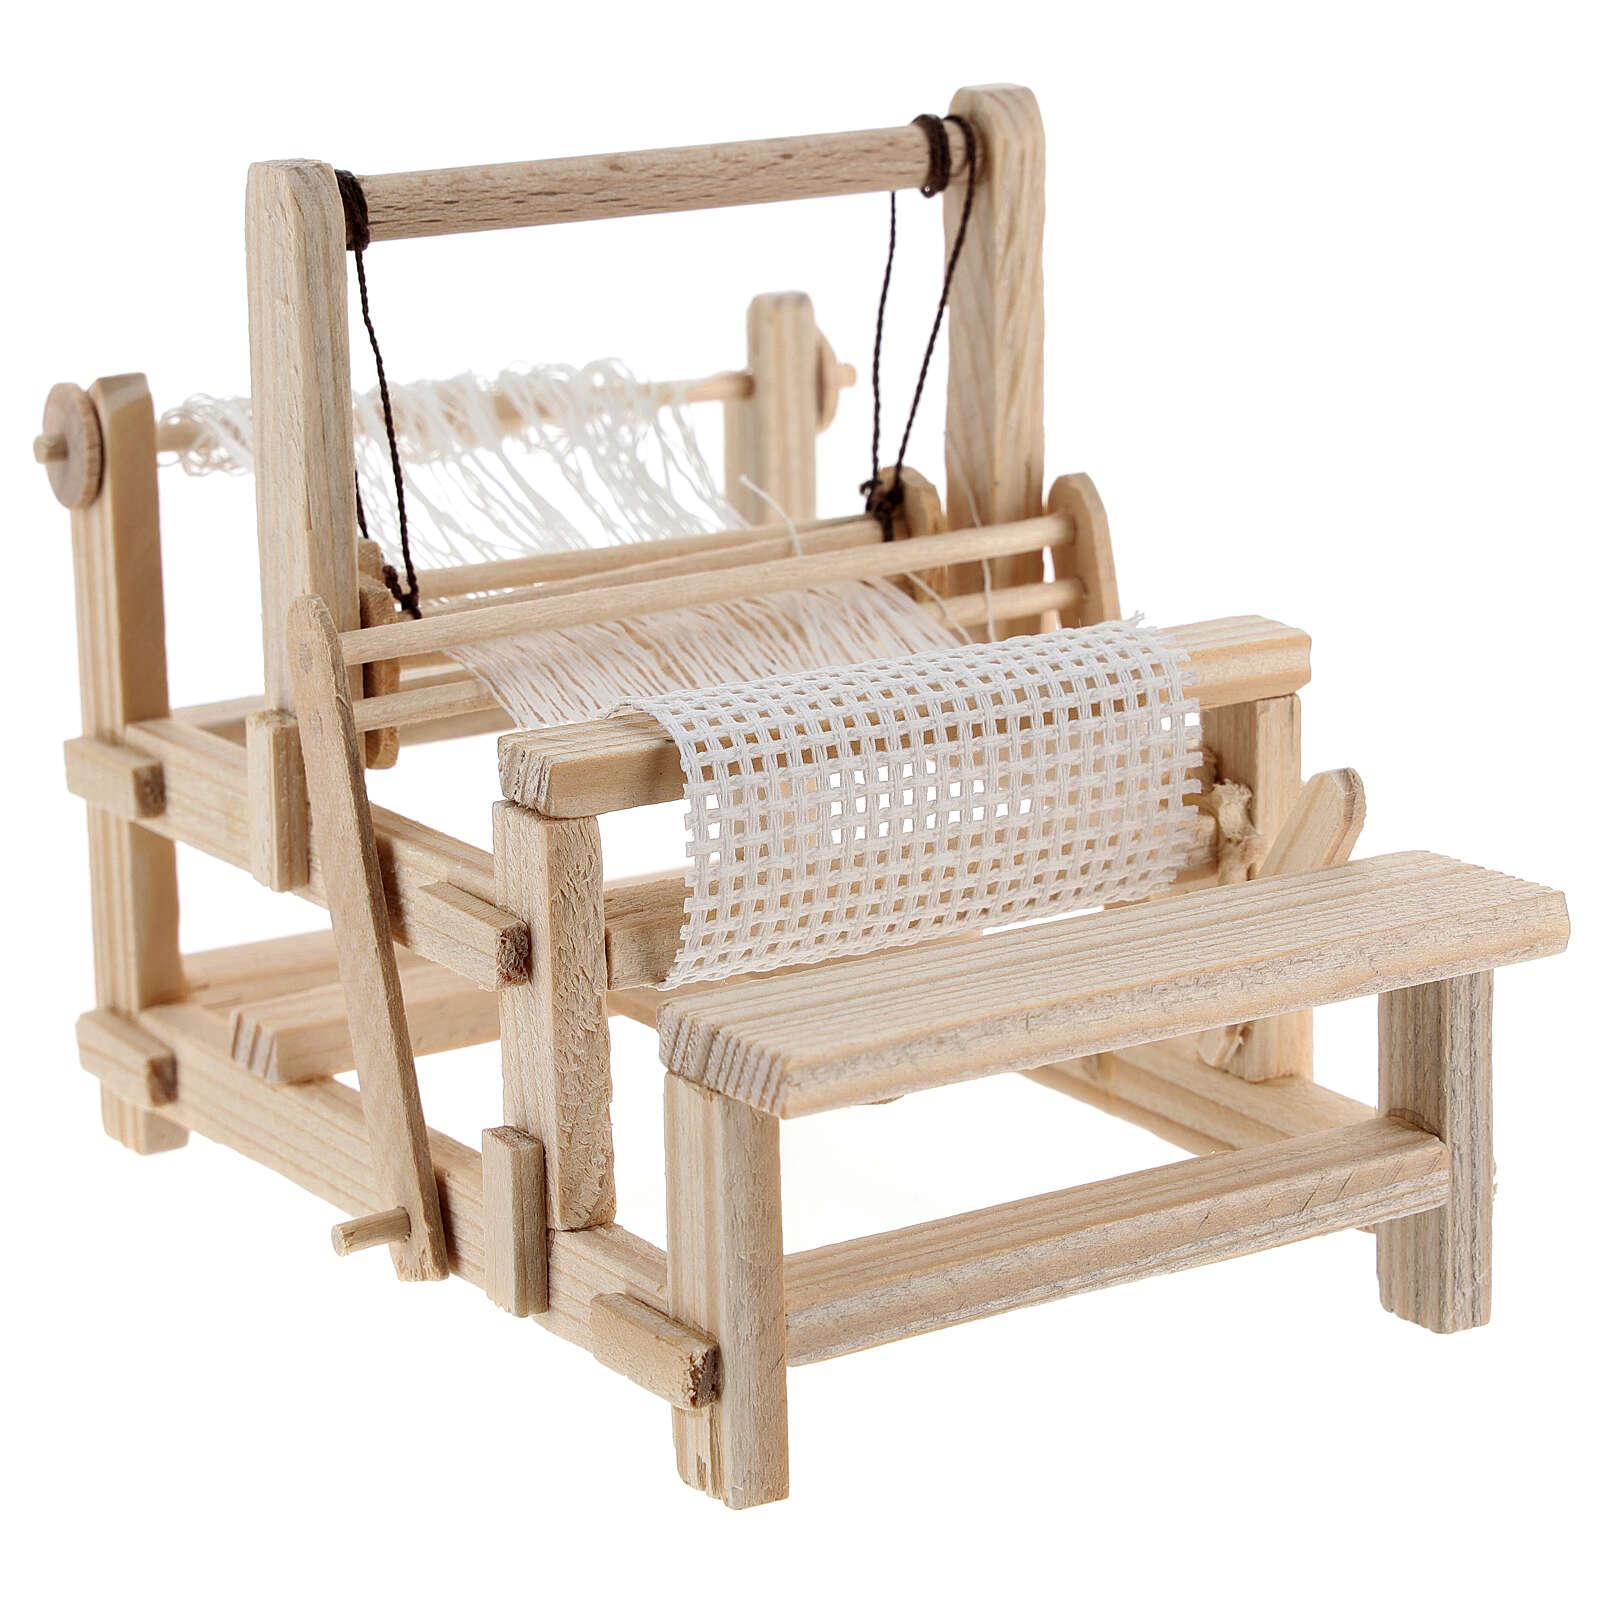 Telaio legno 10x10x5 cm presepe 12-14 cm 4